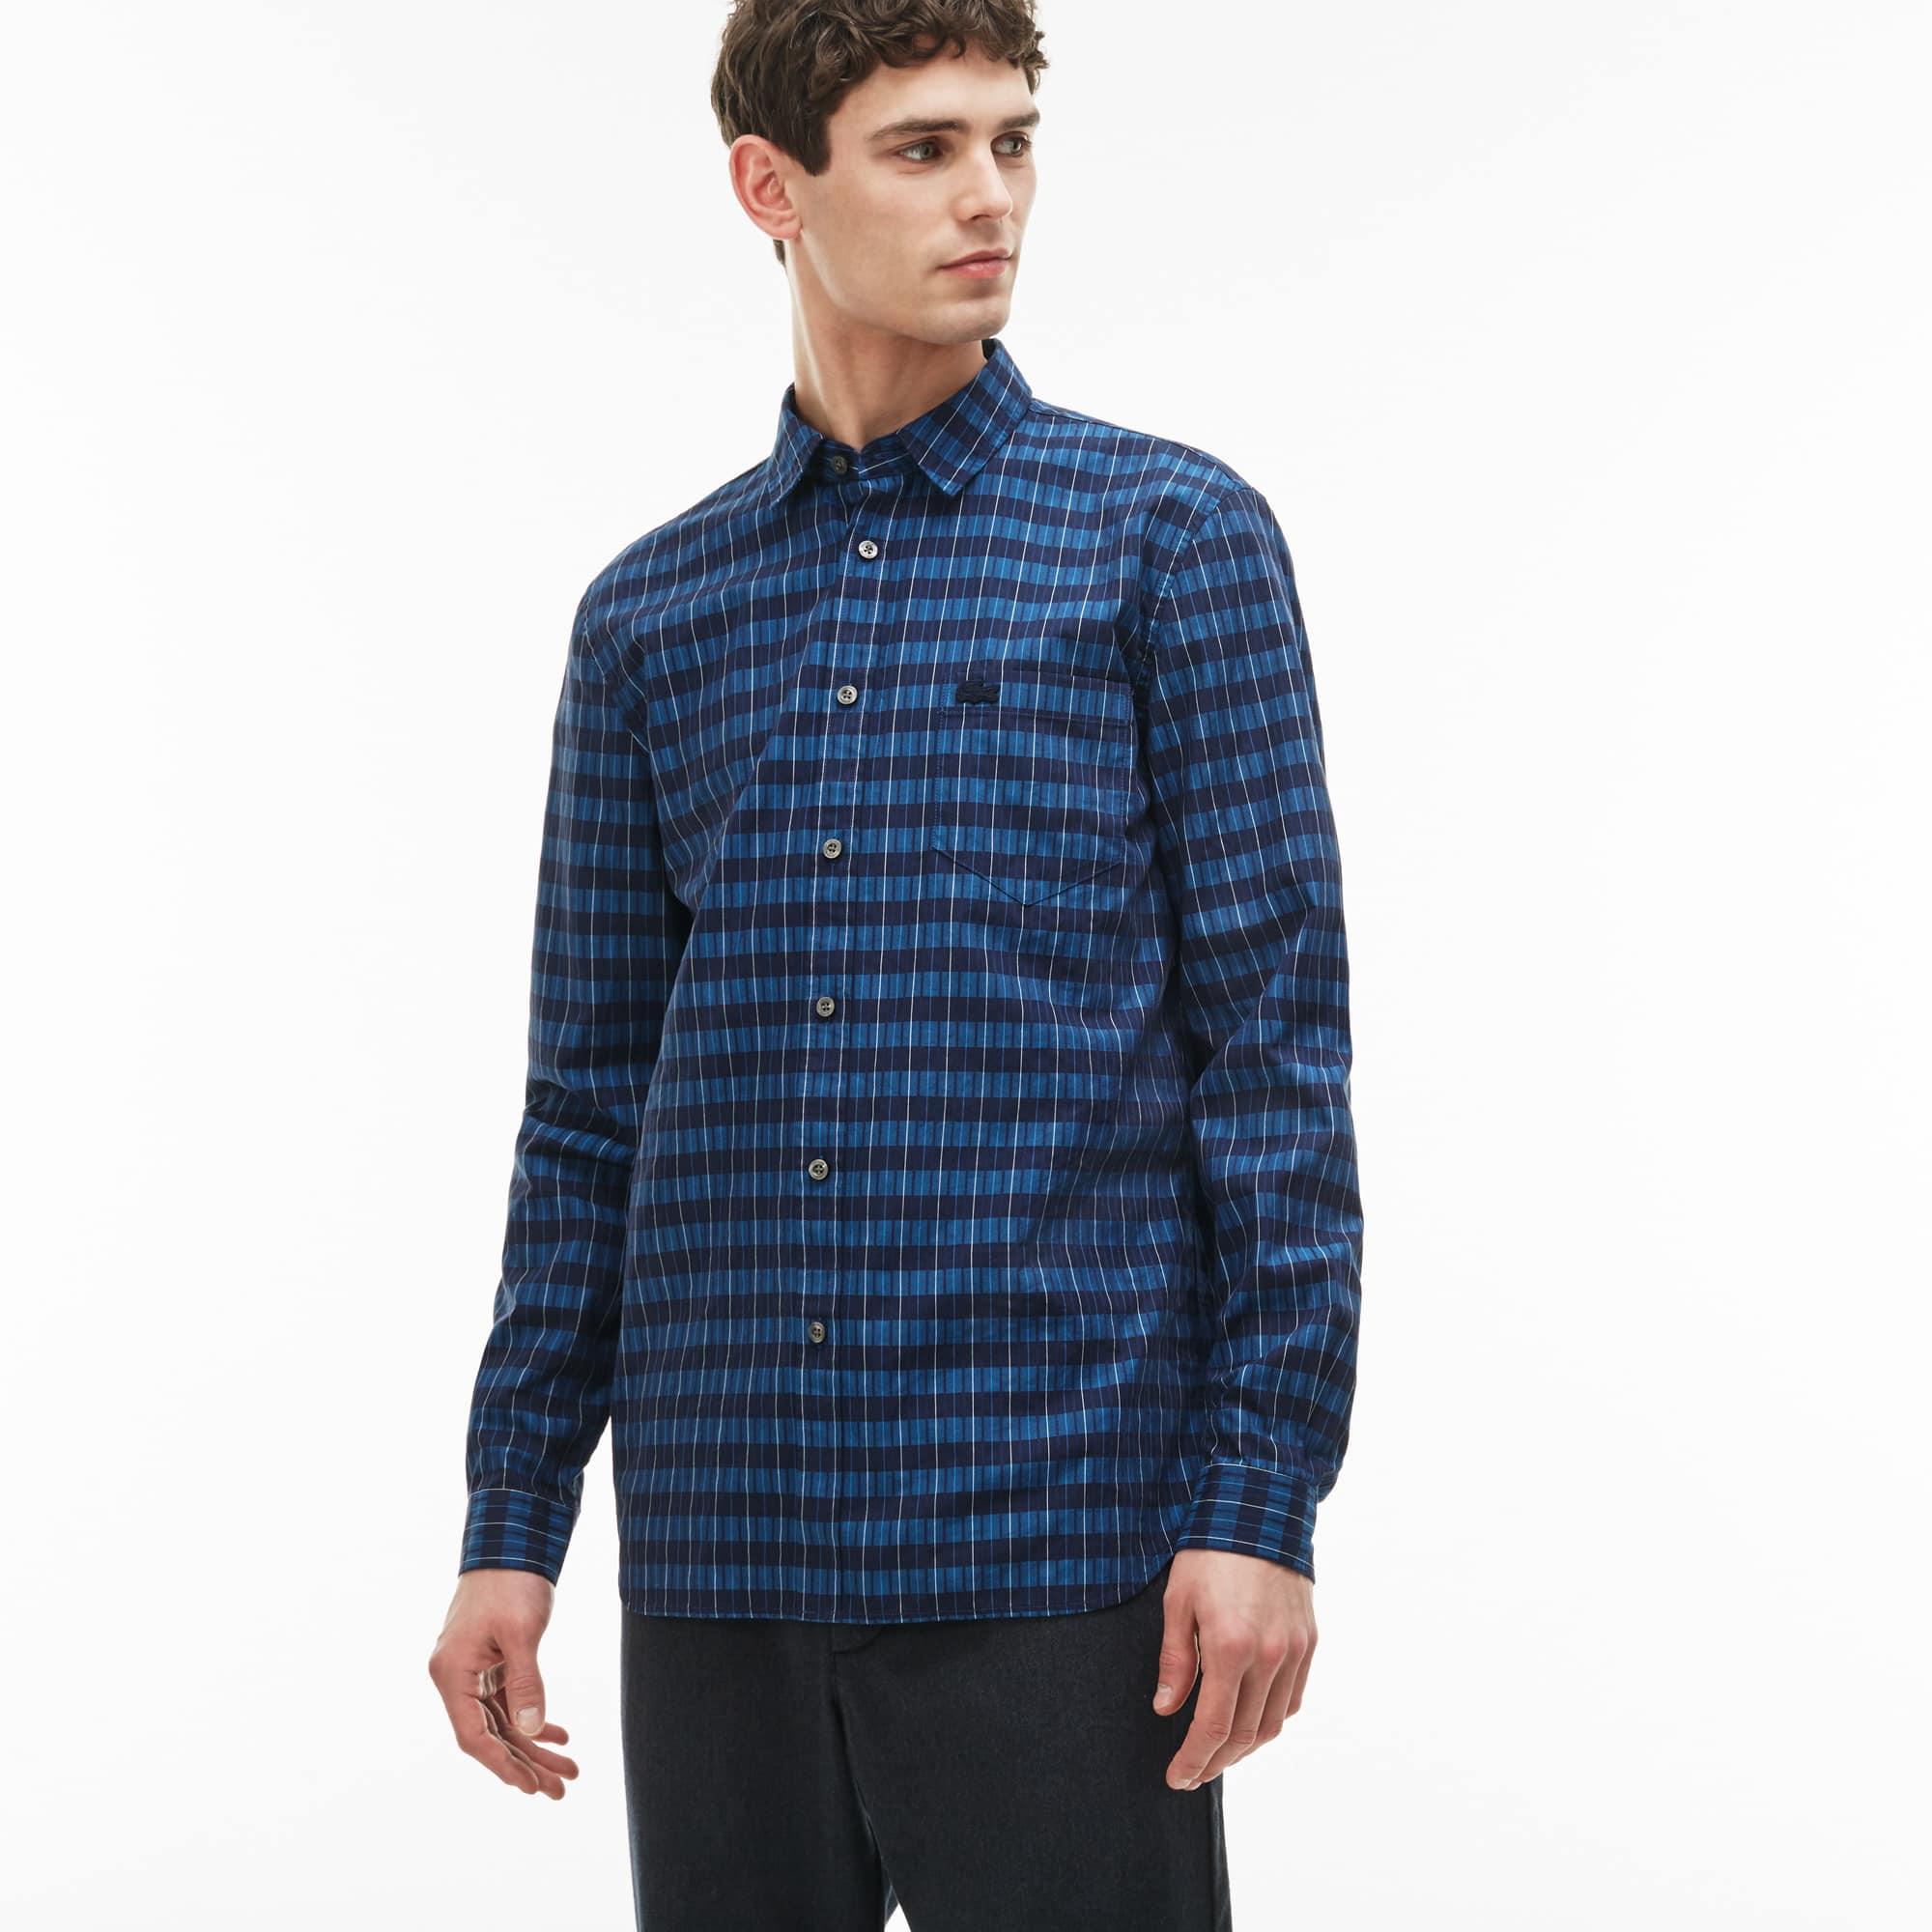 Men's Regular Fit Texturized Stripe Check Poplin Shirt